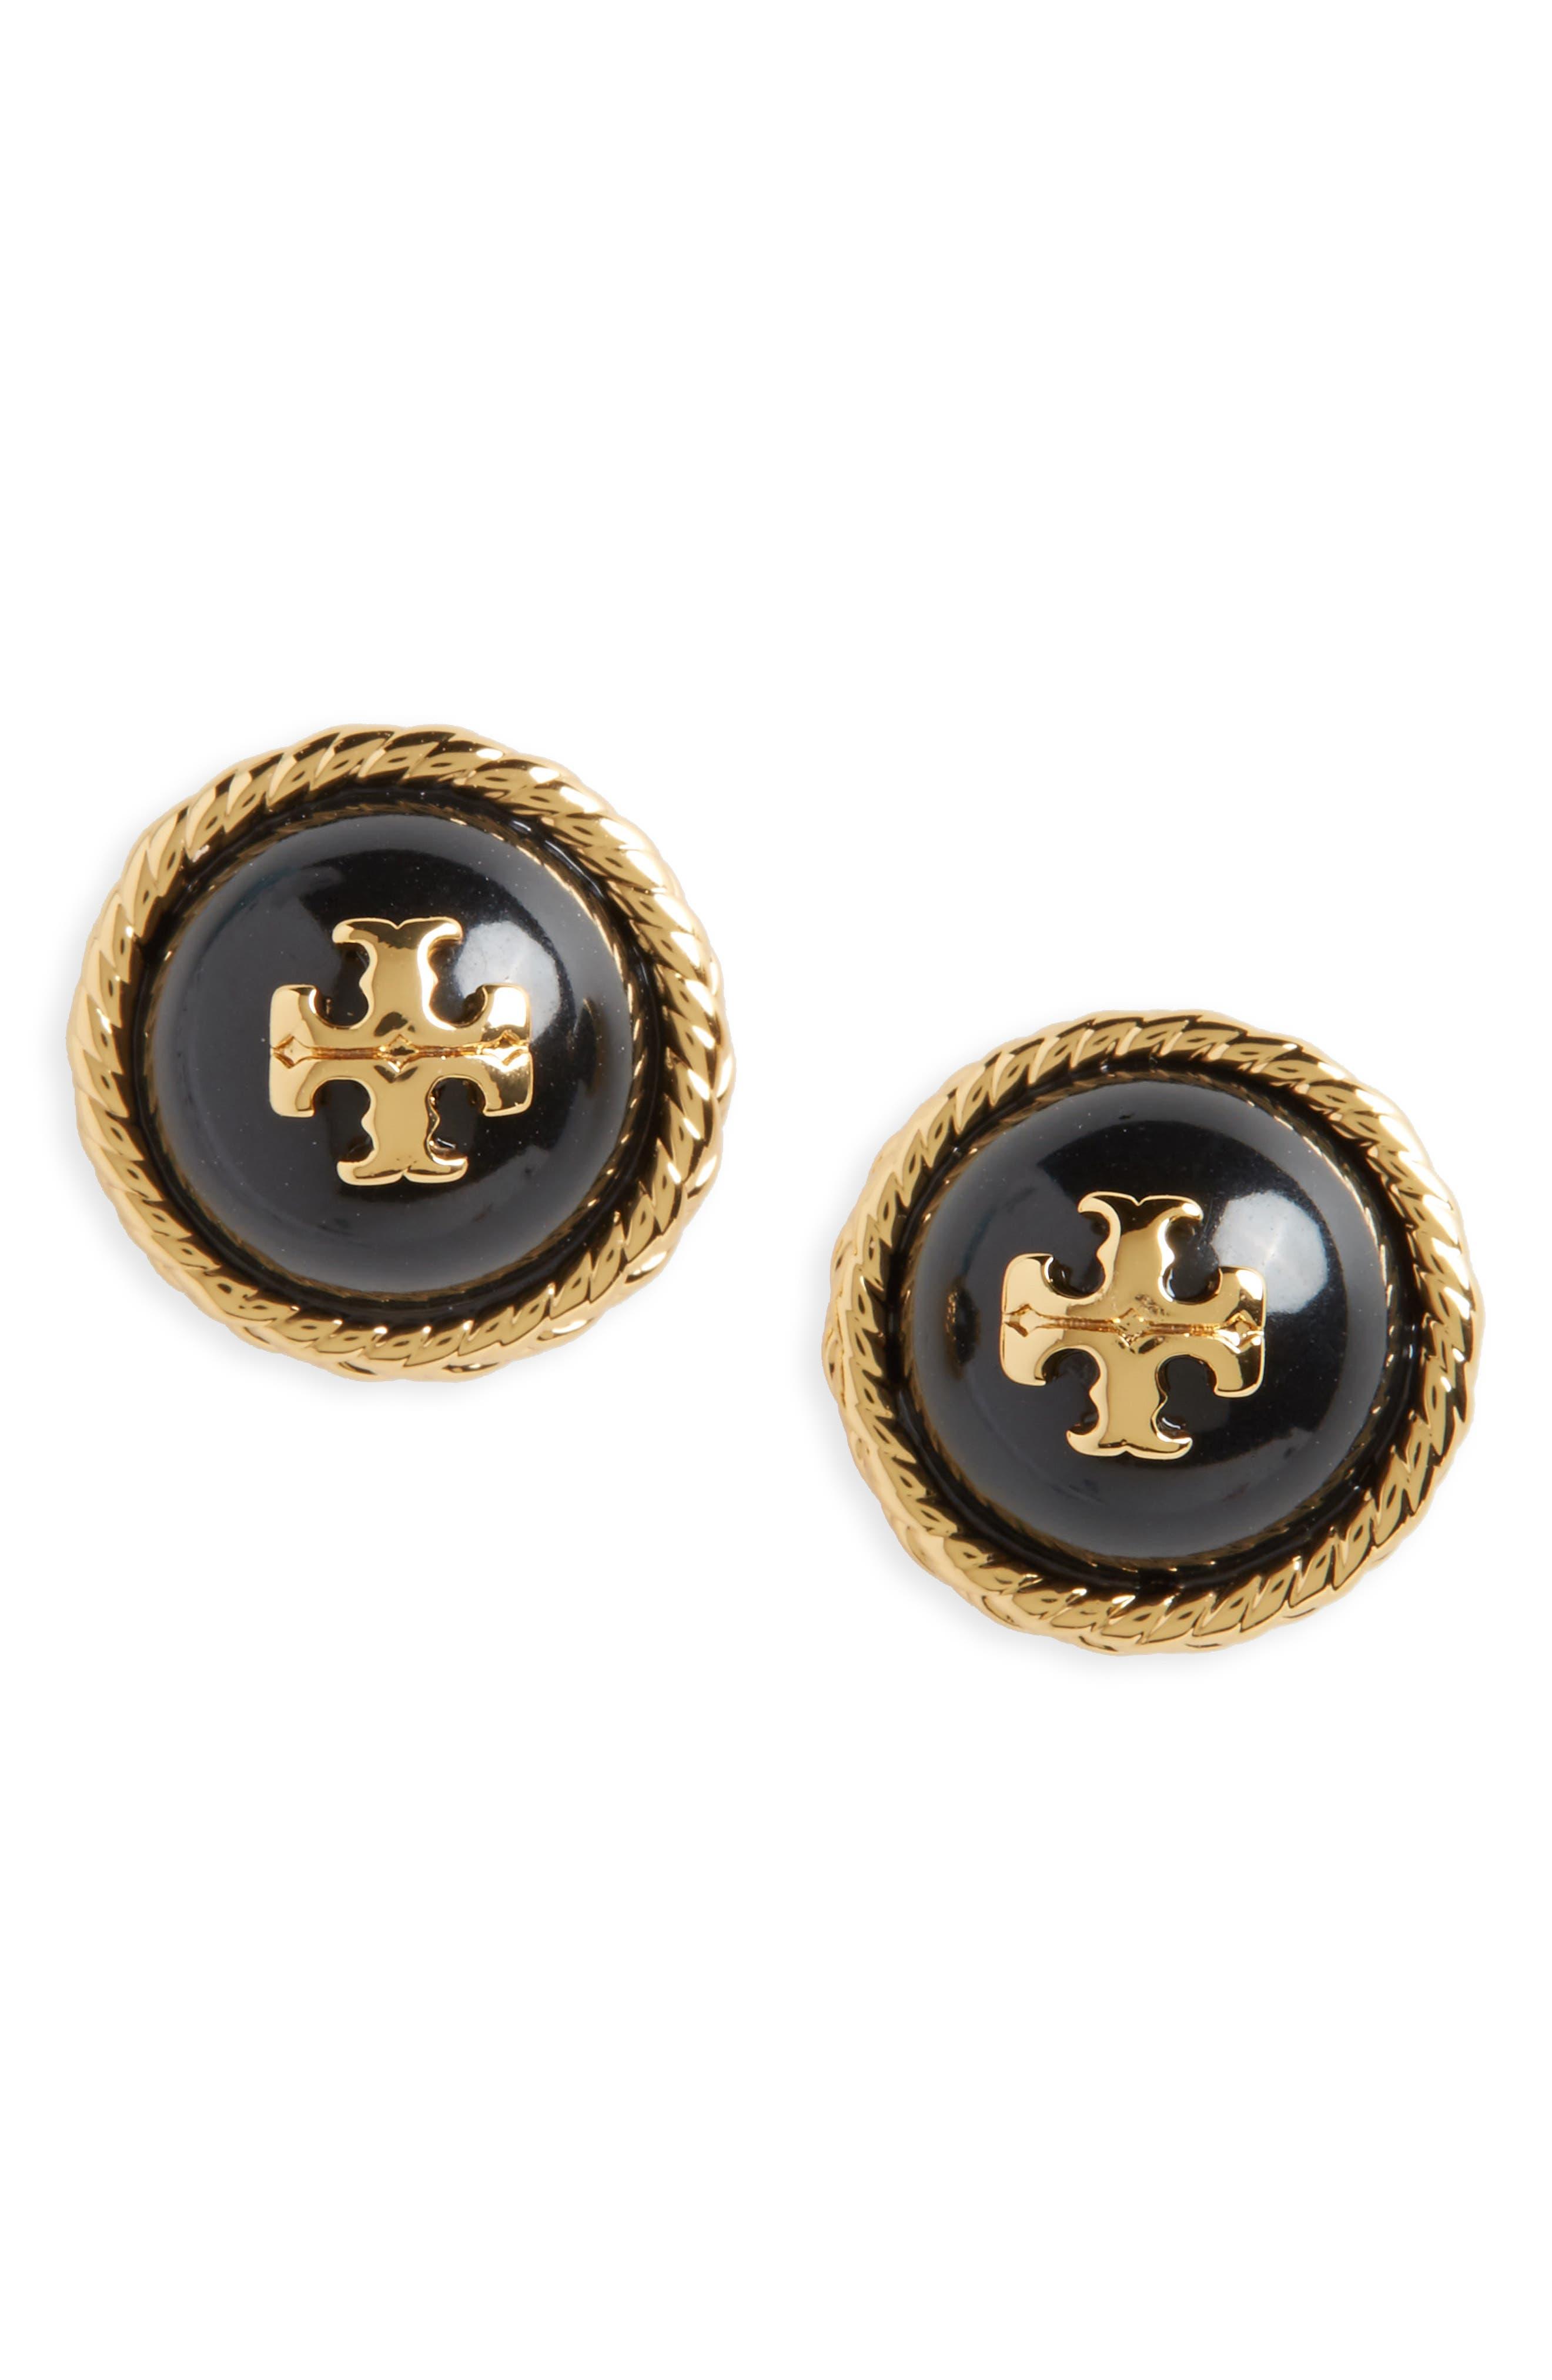 Rope Stud Earrings,                             Main thumbnail 1, color,                             Black / Tory Gold